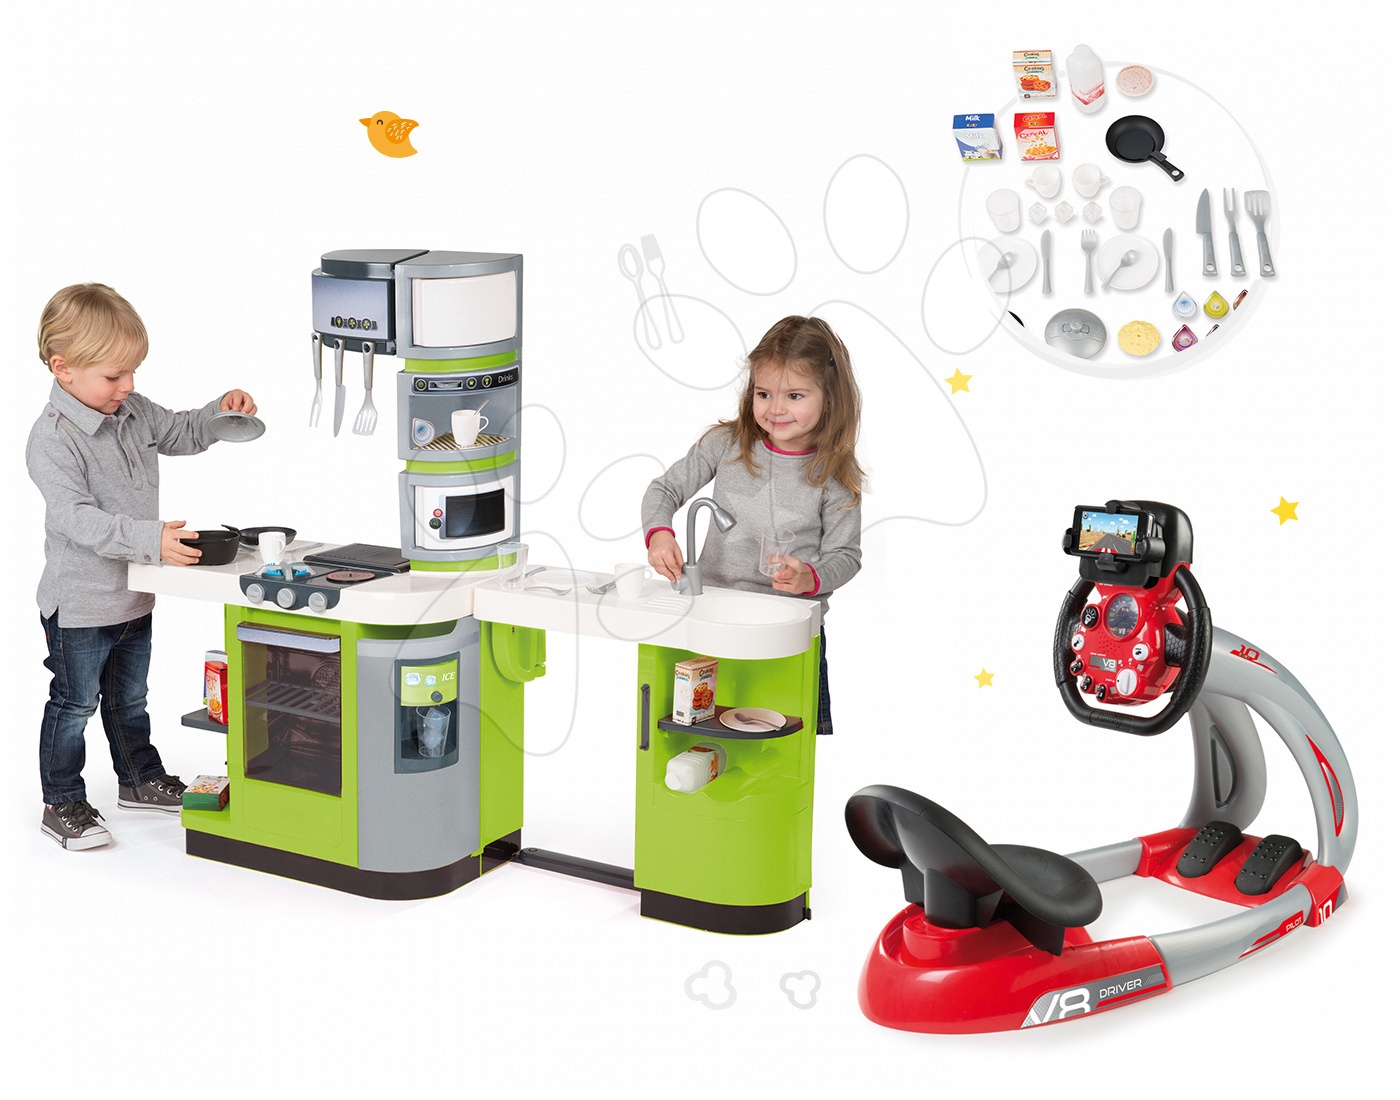 Smoby set detská kuchynka CookMaster Verte a trenažér V8 Driver 311102-21